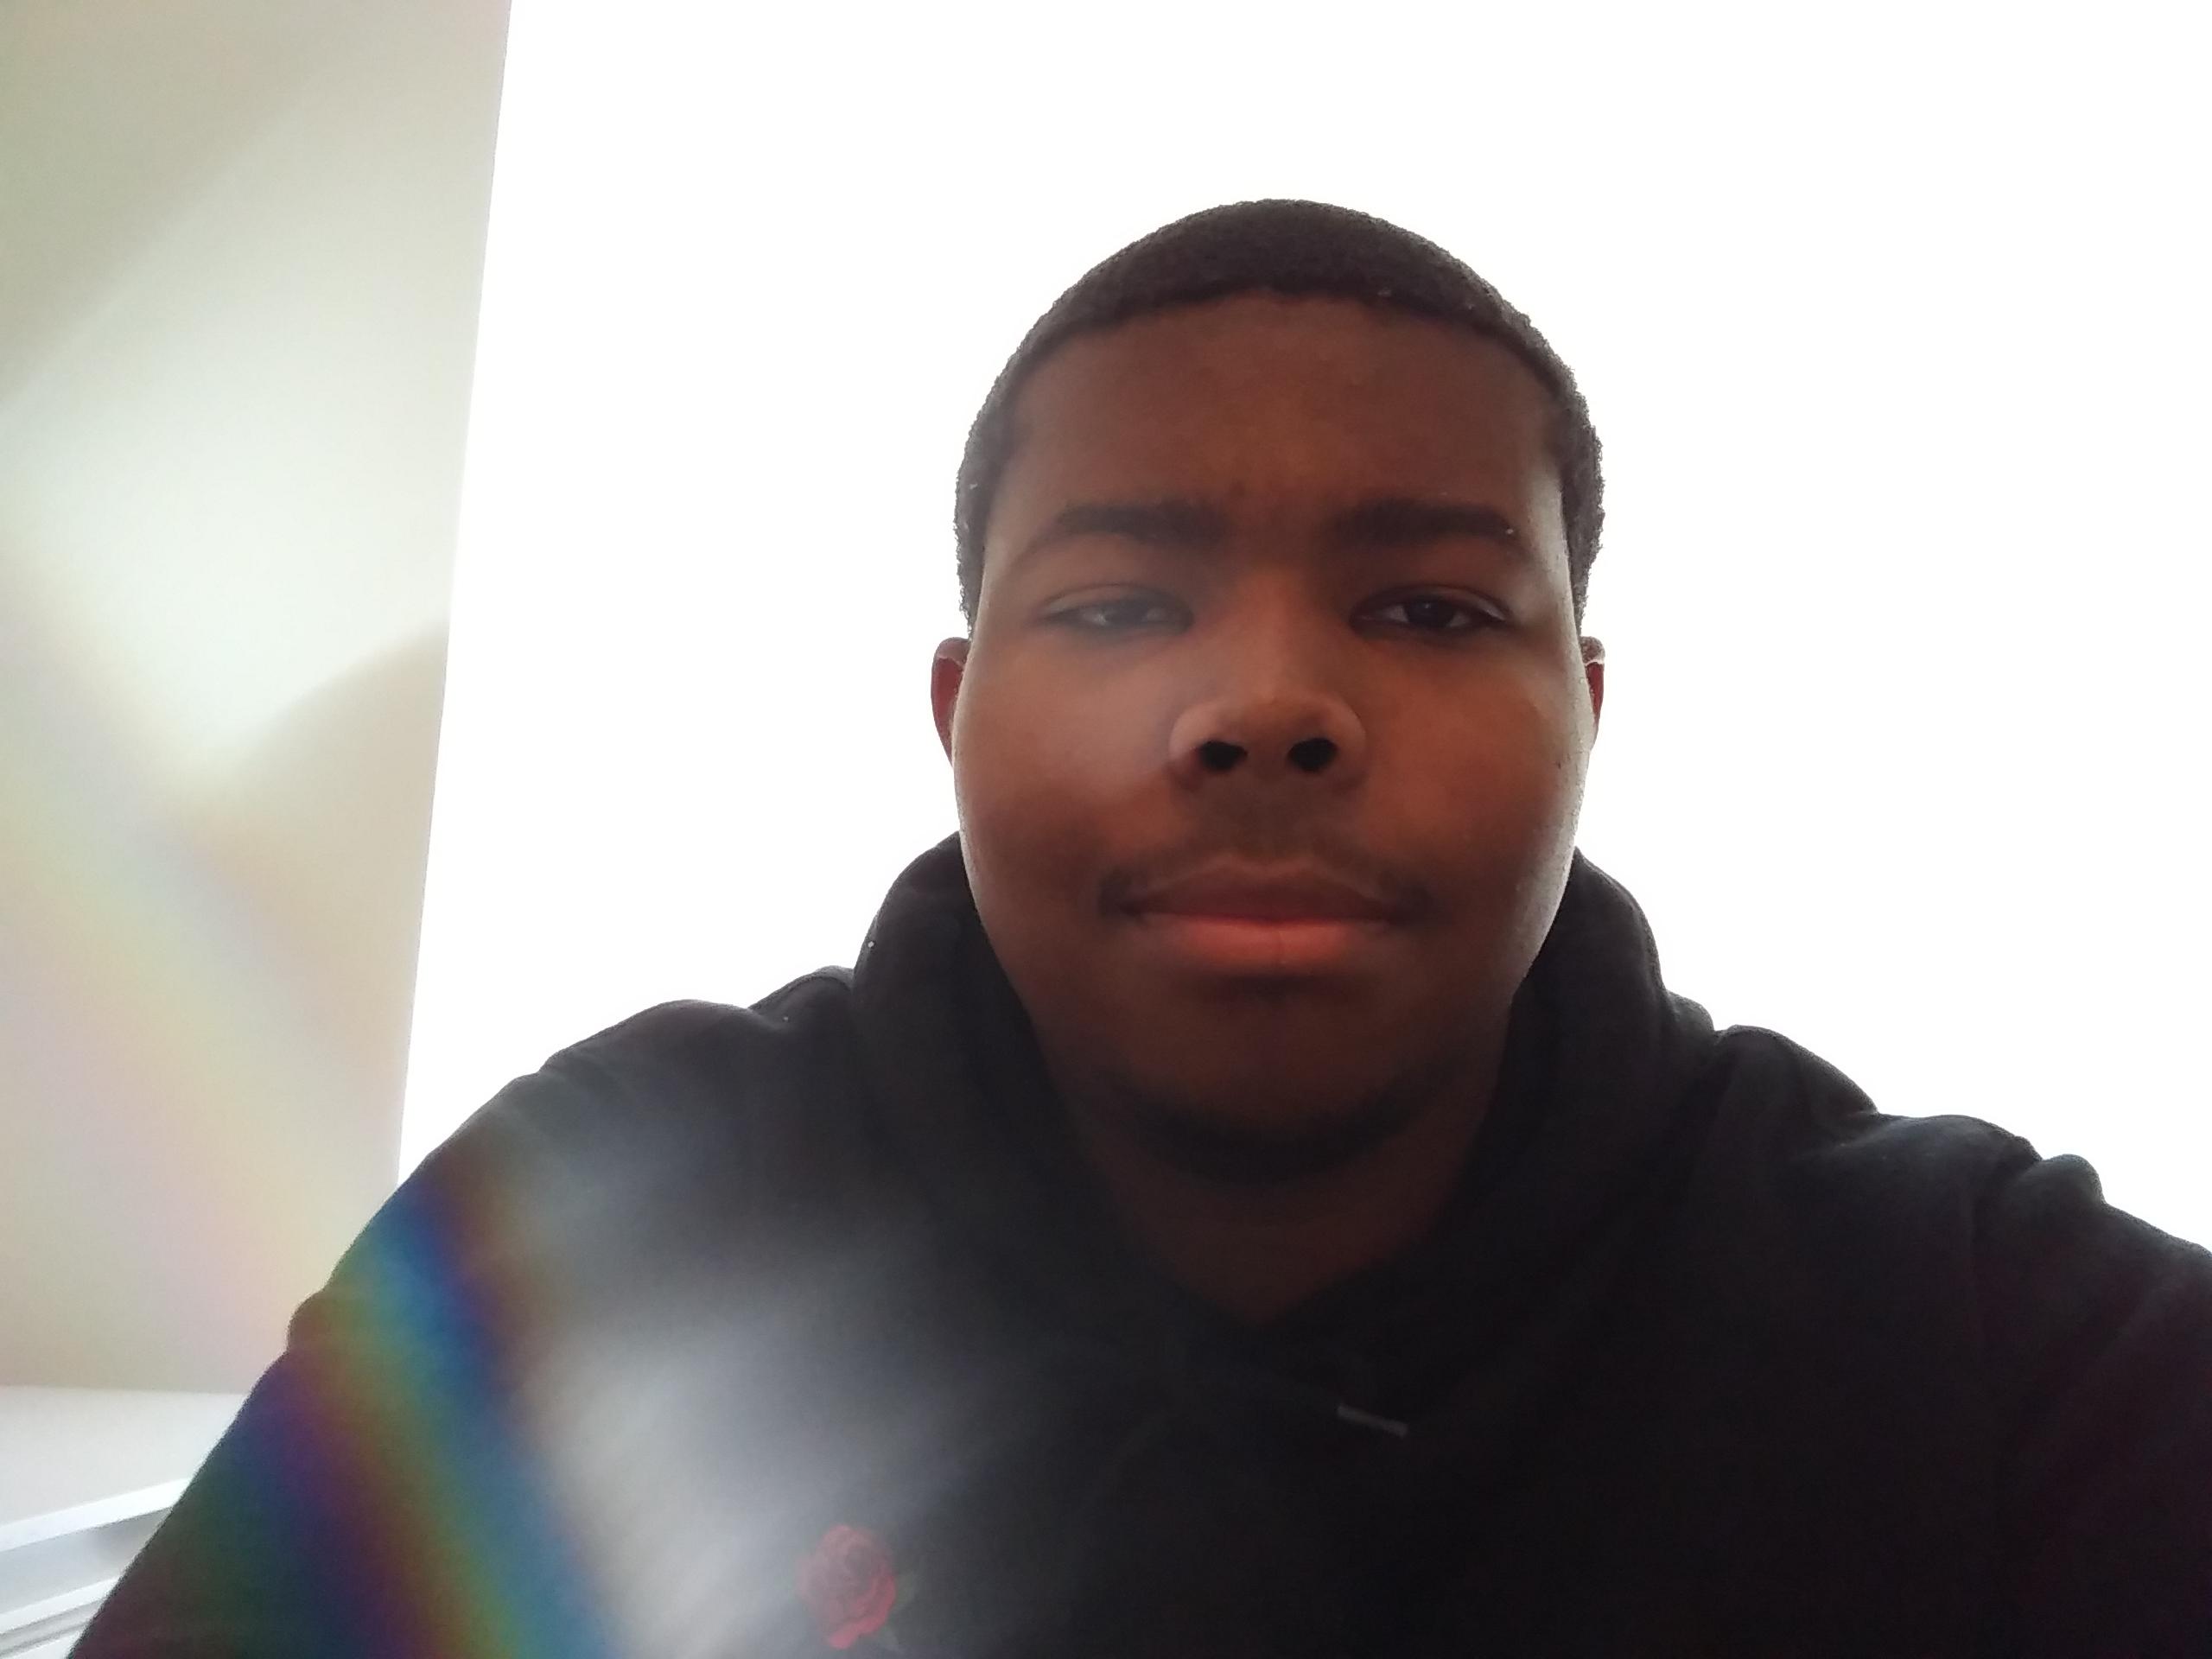 Elijah's #BecauseWeWill Story